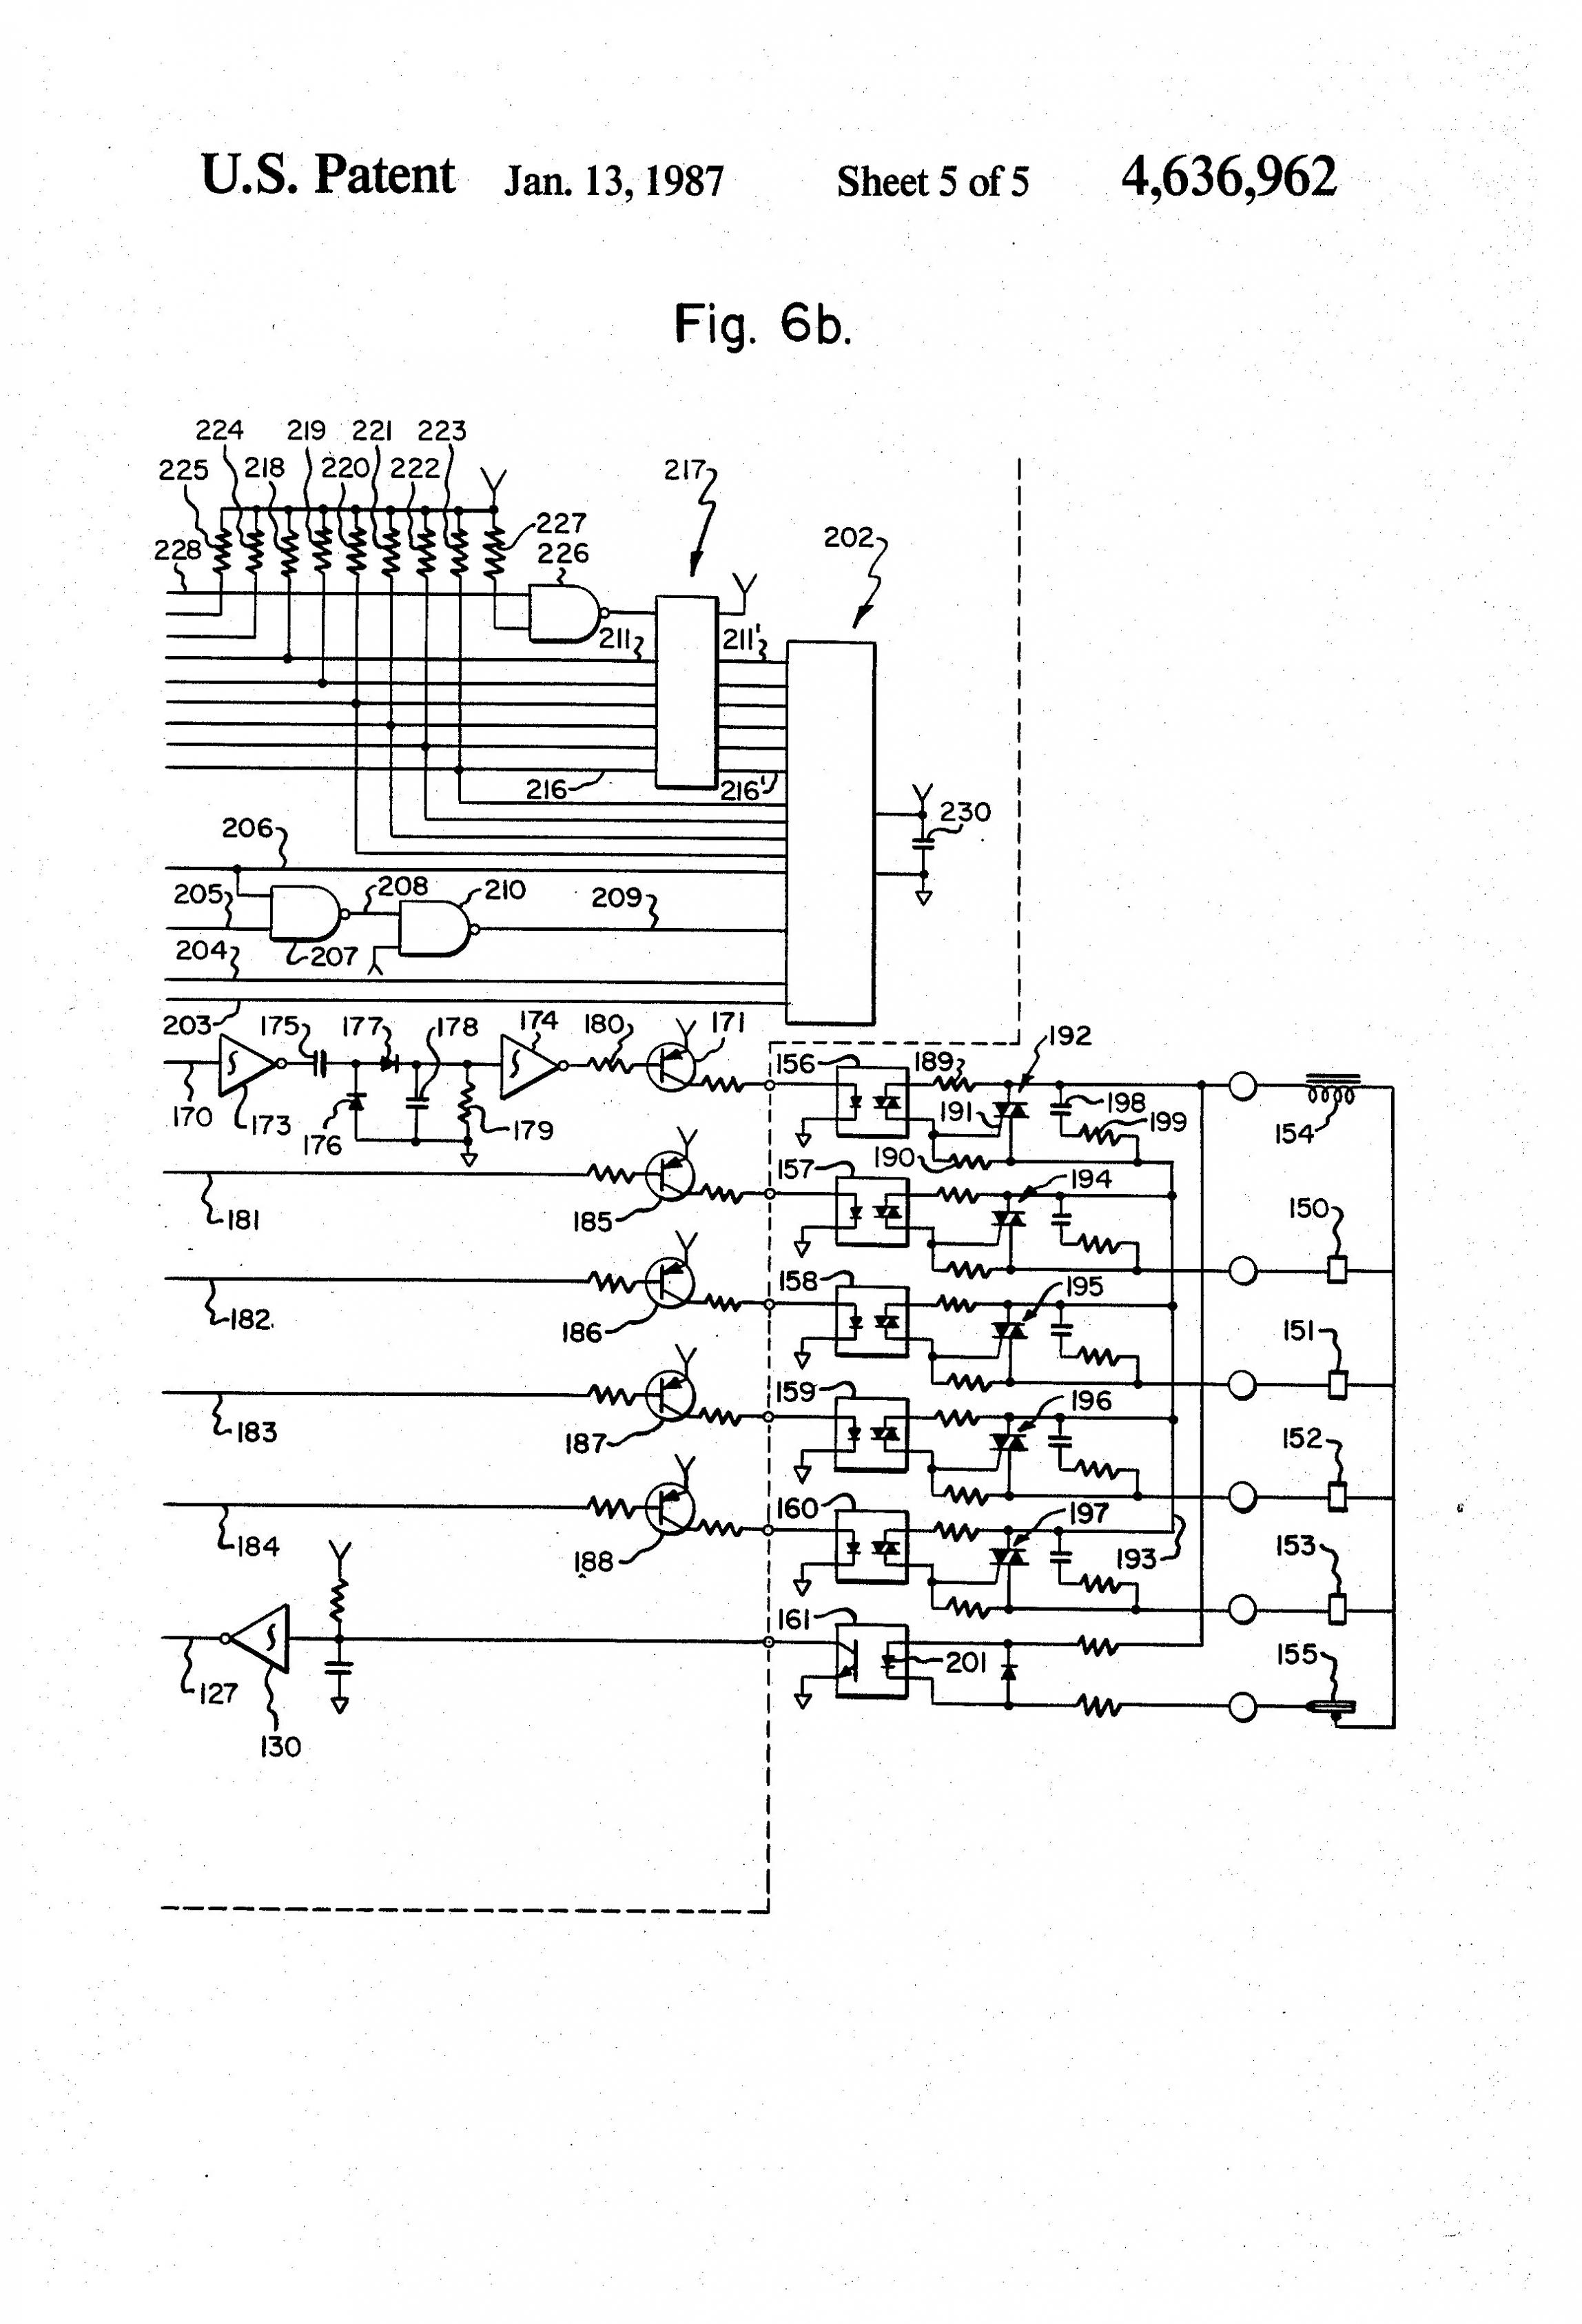 12 Lead Generator Wiring Diagrams | Wiring Diagram - 3 Phase Motor Wiring Diagram 12 Leads